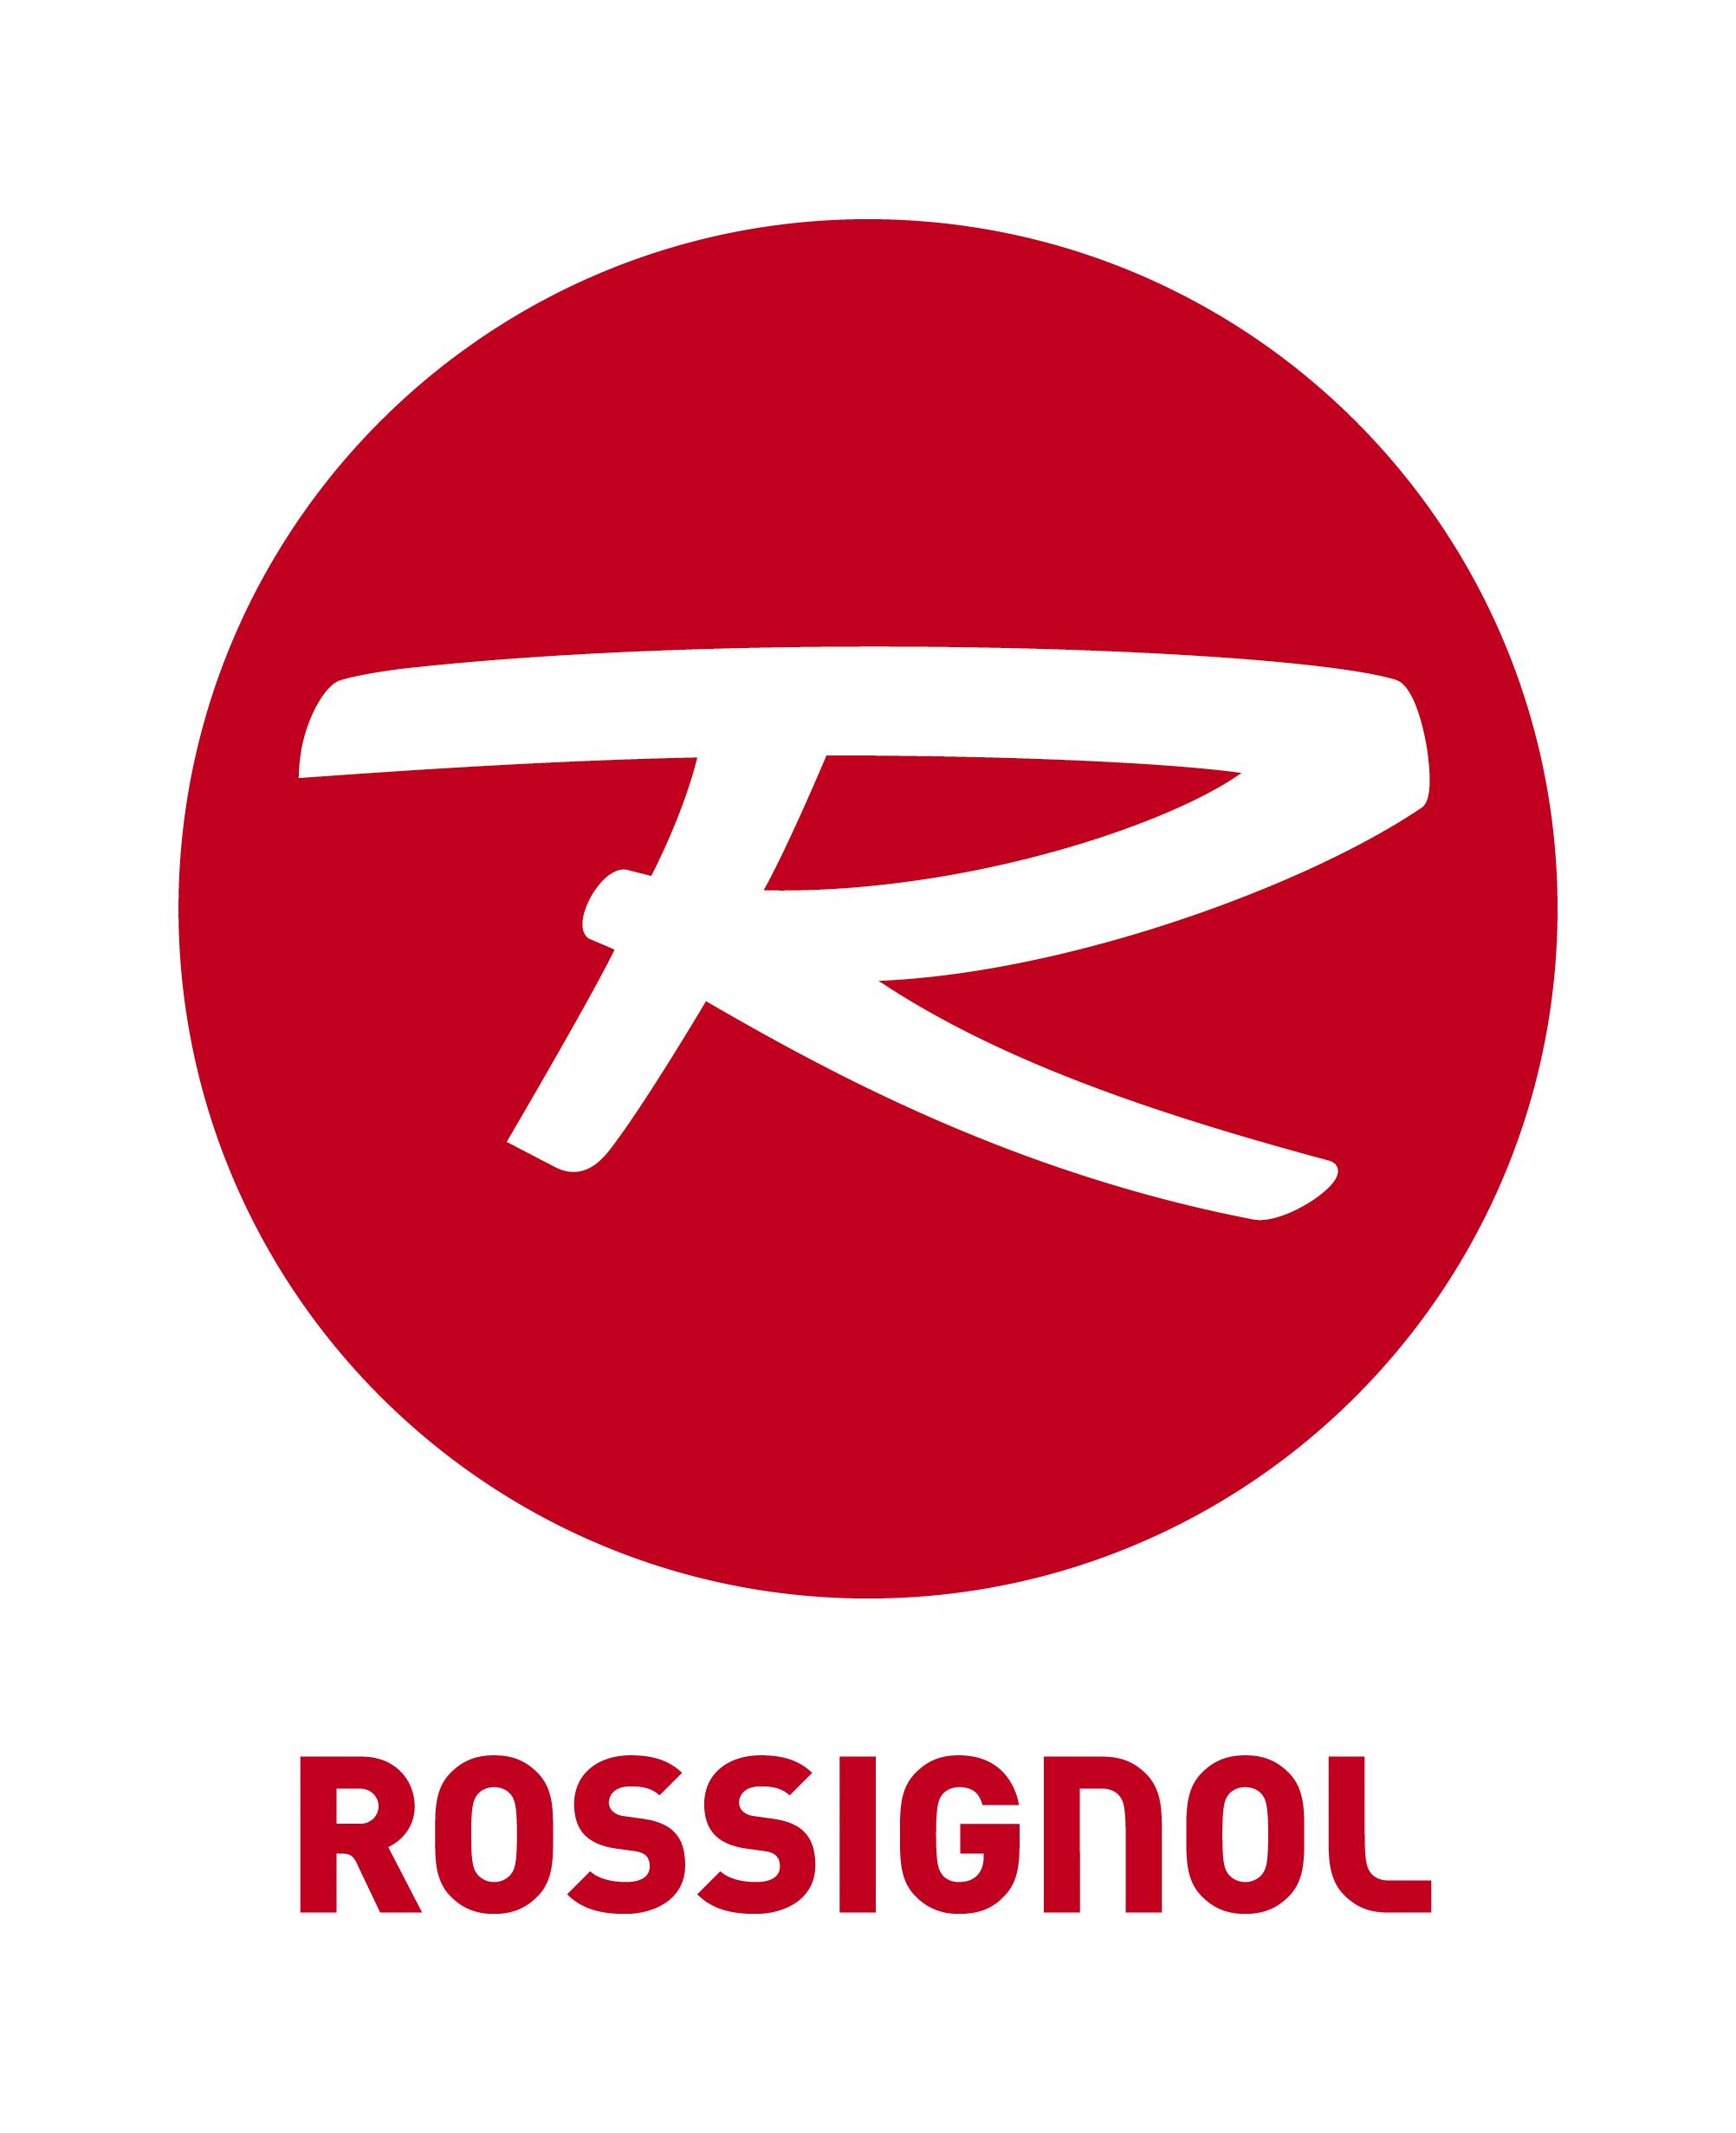 RRossignol_SQUARE_REDjpg